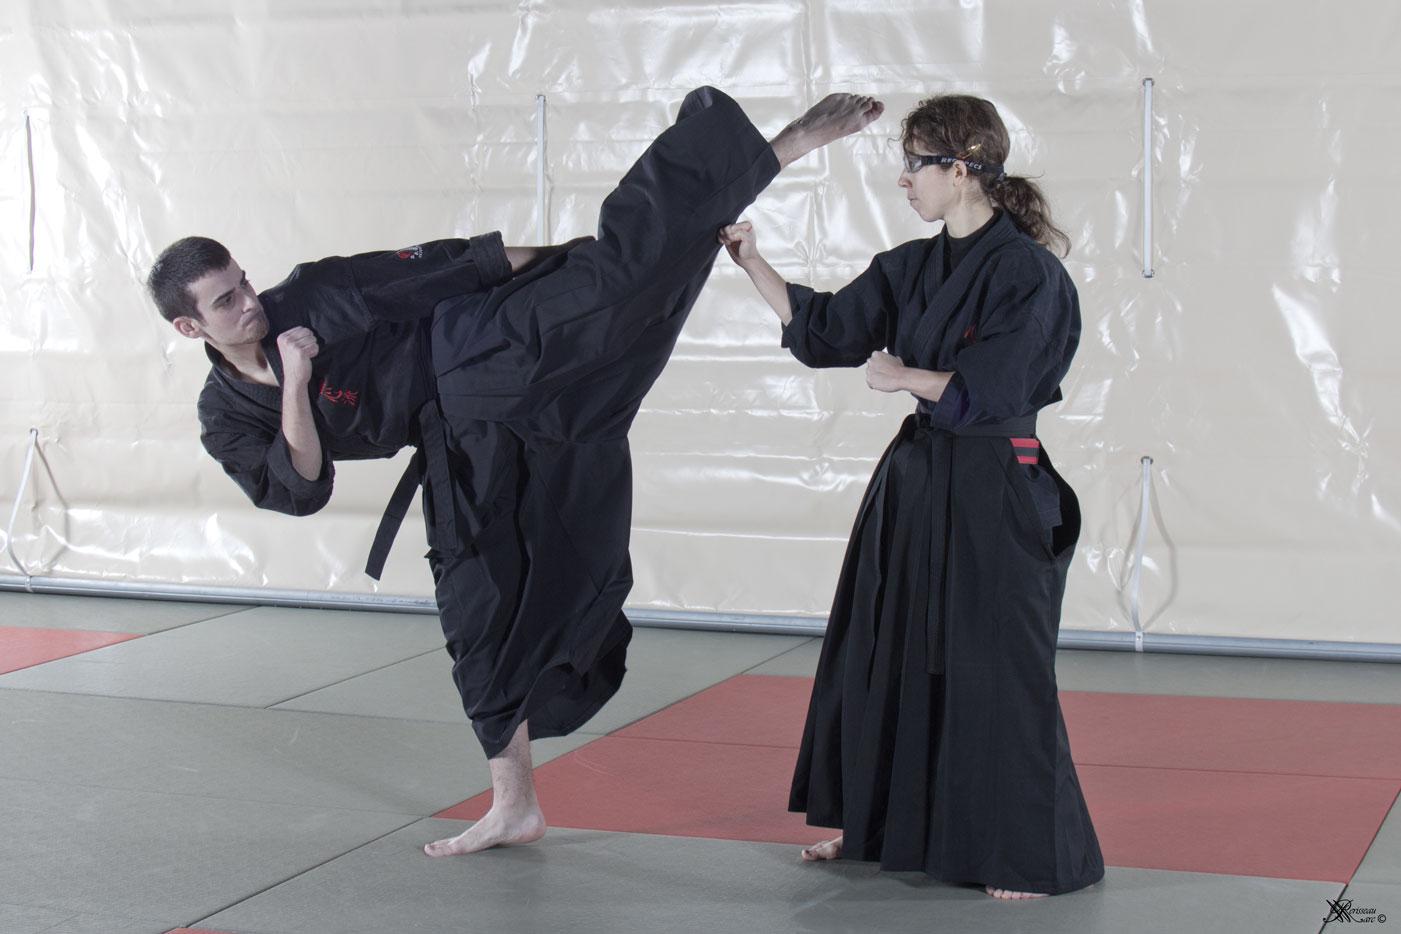 Mushin Ryu Ju Jutsu - Mawashi geri